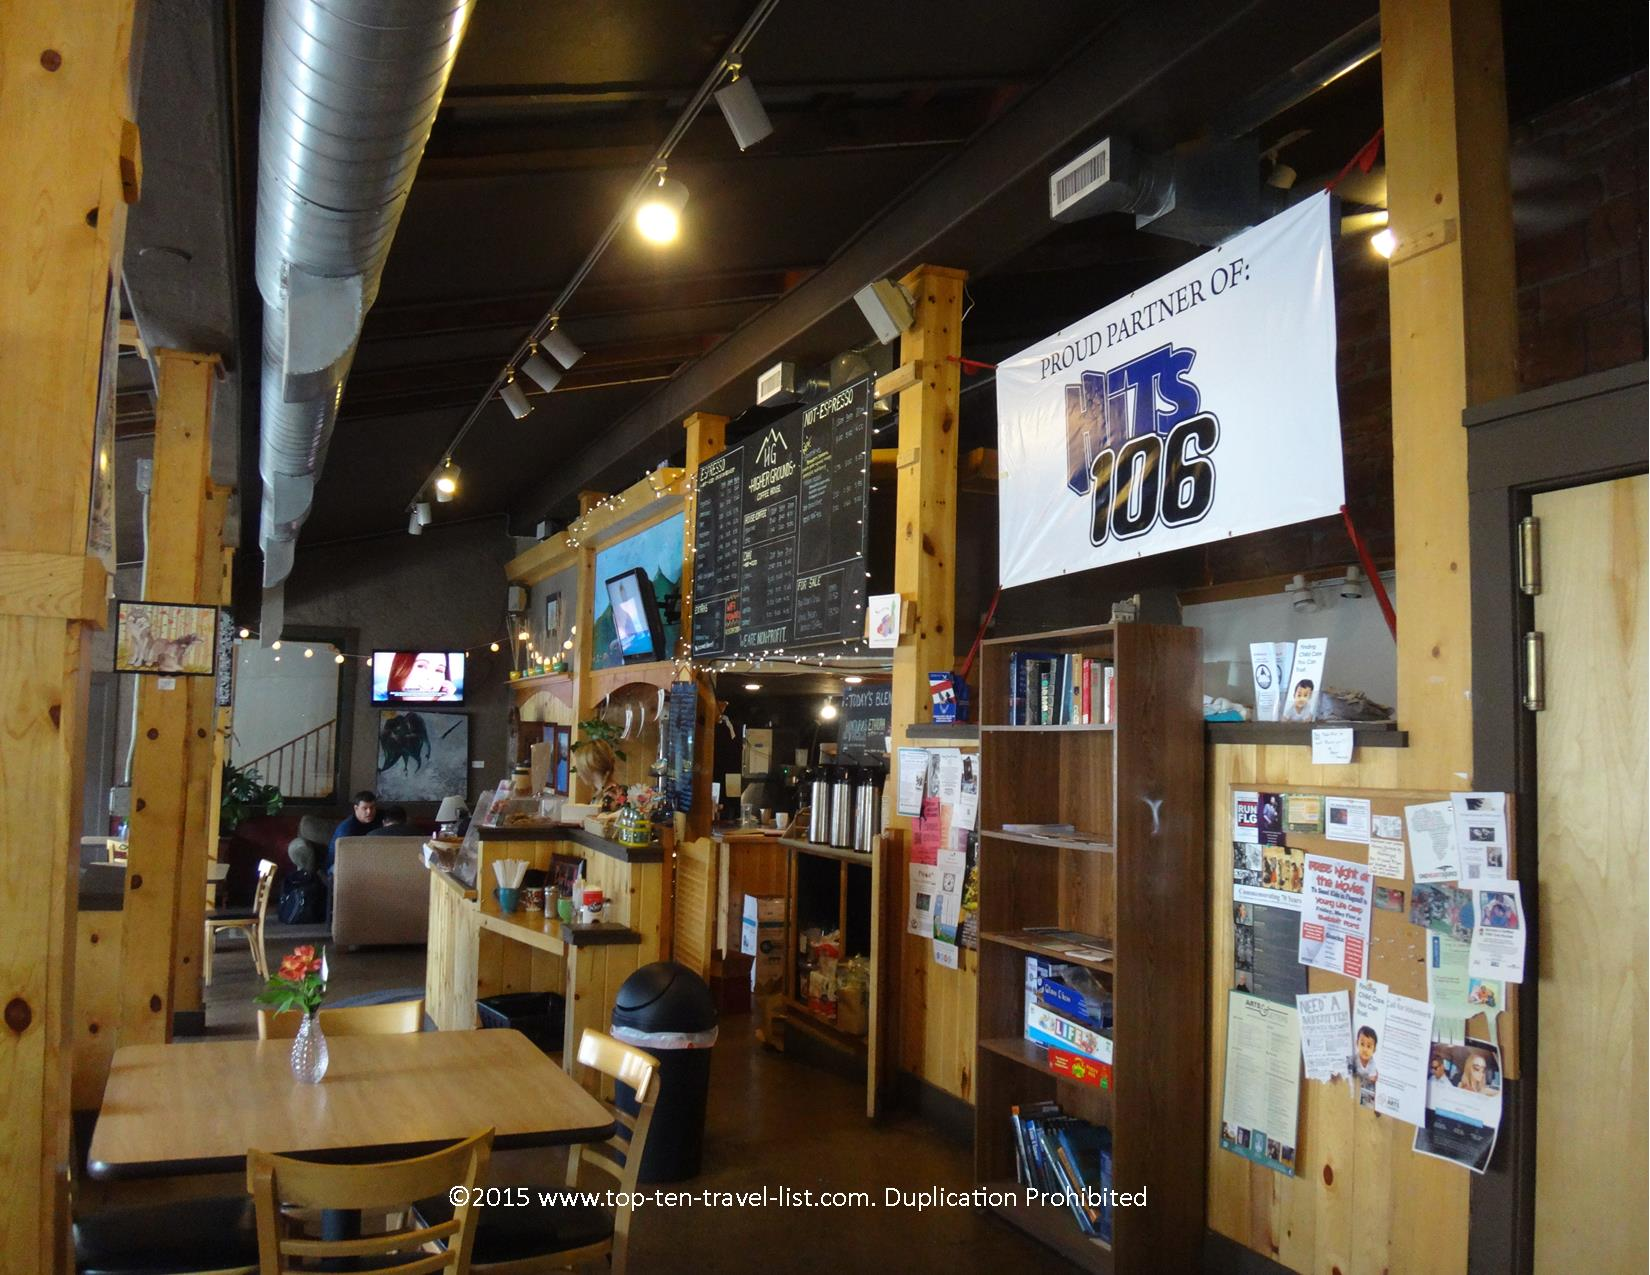 Higher Grounds Coffee shop in Flagstaff, Arizona